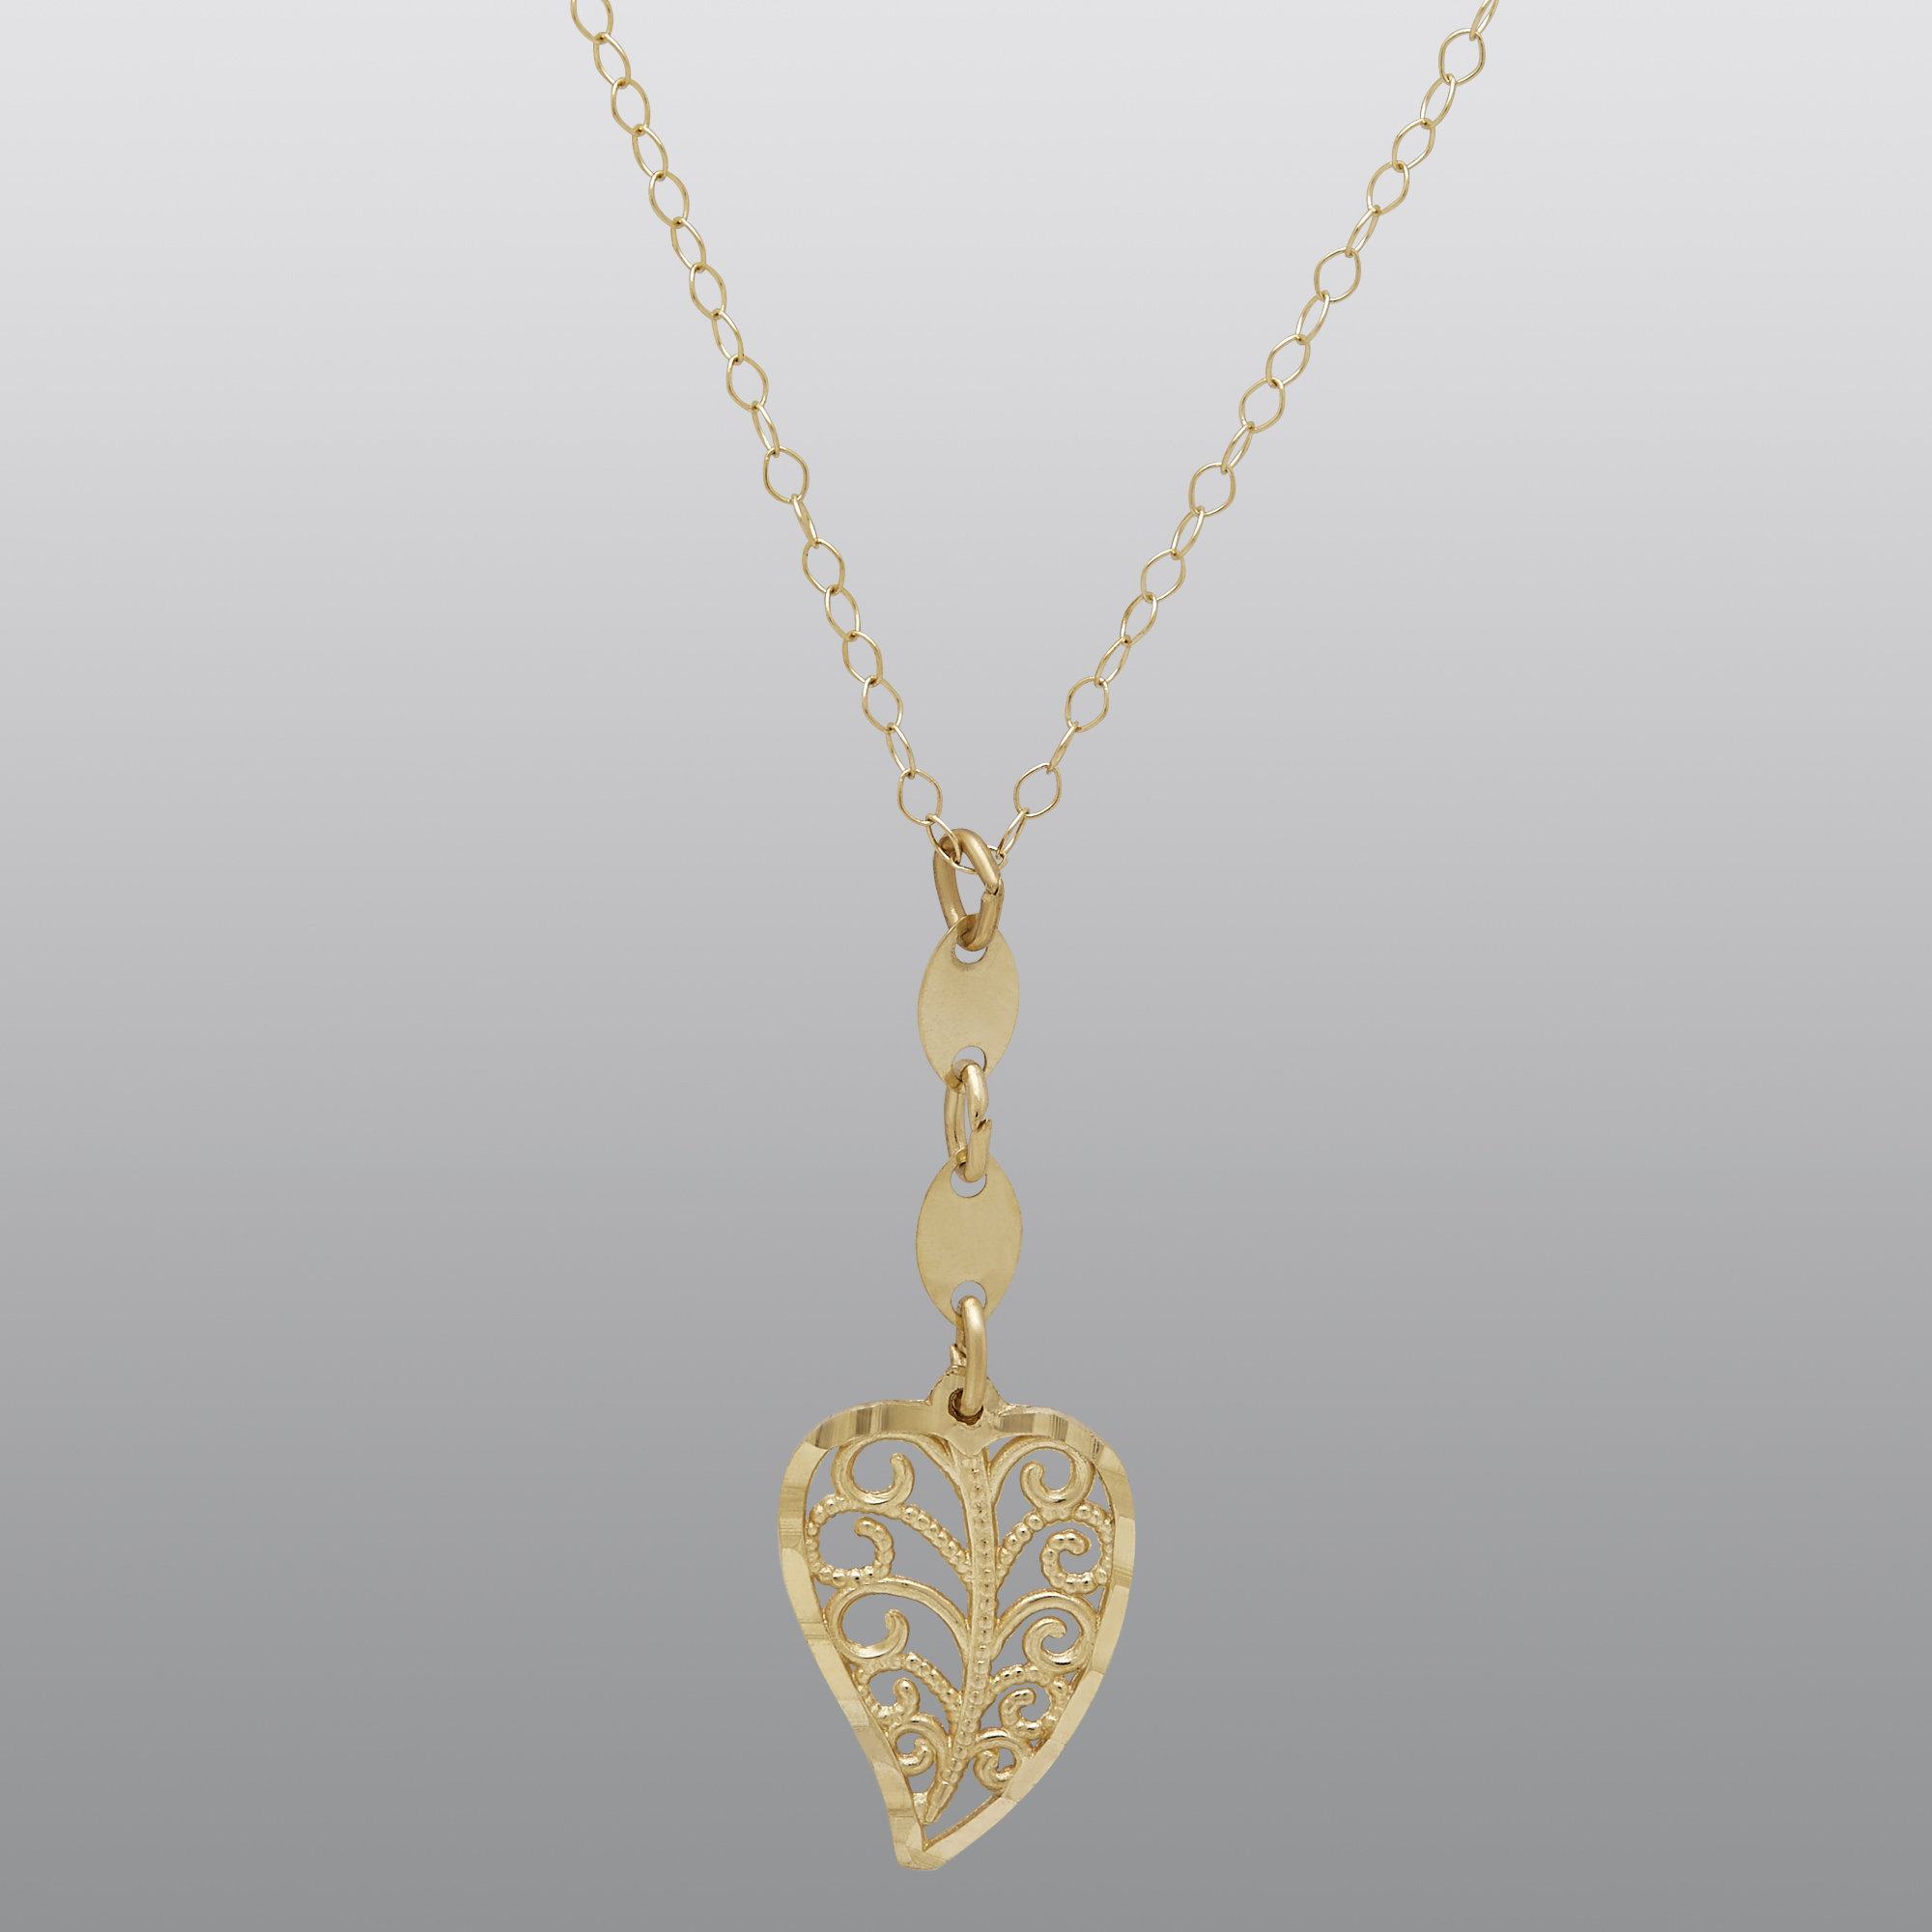 10K Diamond Cut Filigree Heart Drop Necklace